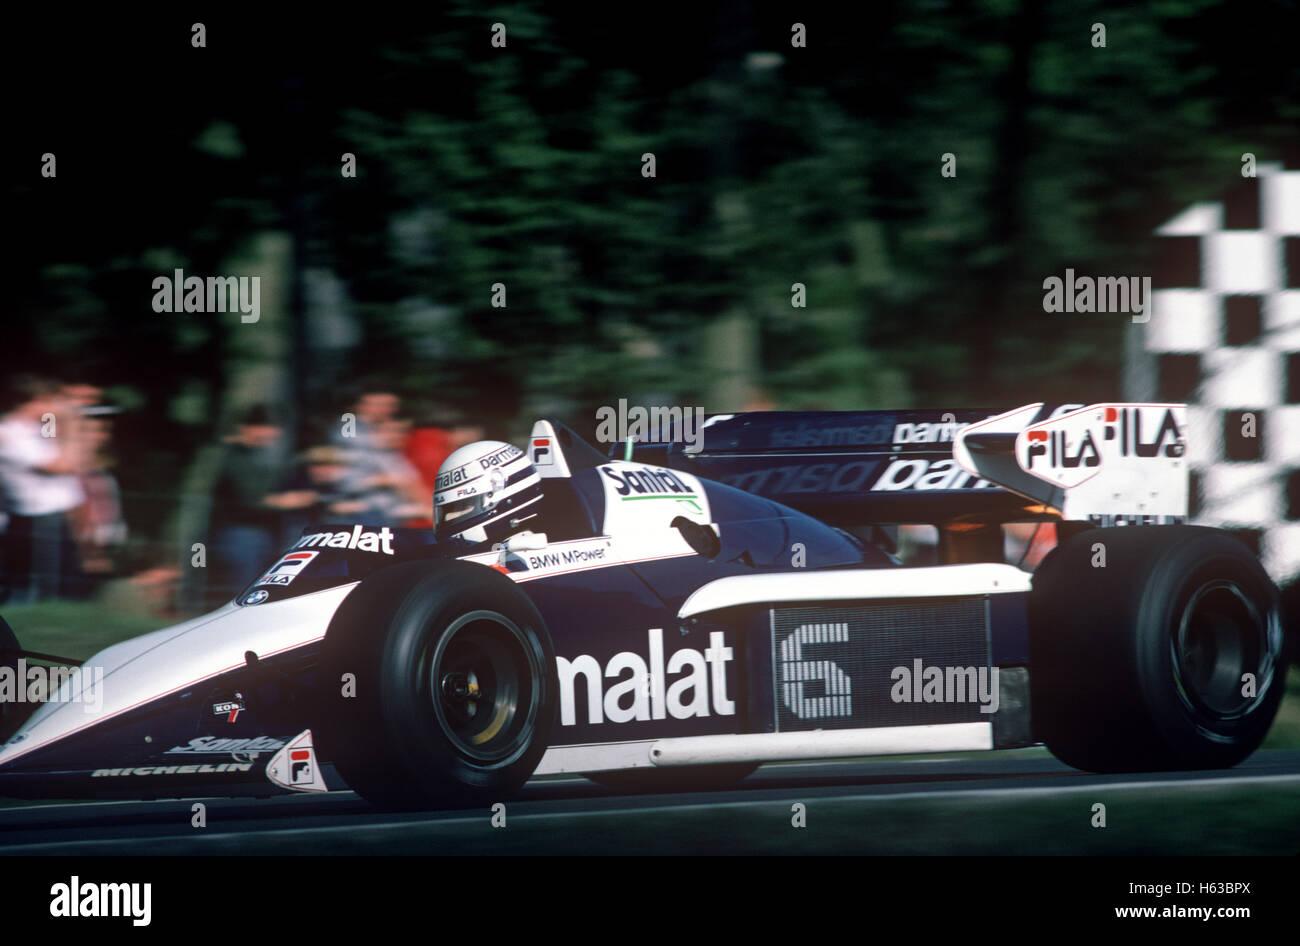 Nelson Piquet Brabham BT52 en el GP Británico de Brands Hatch 1983 Carrera de Campeones Imagen De Stock